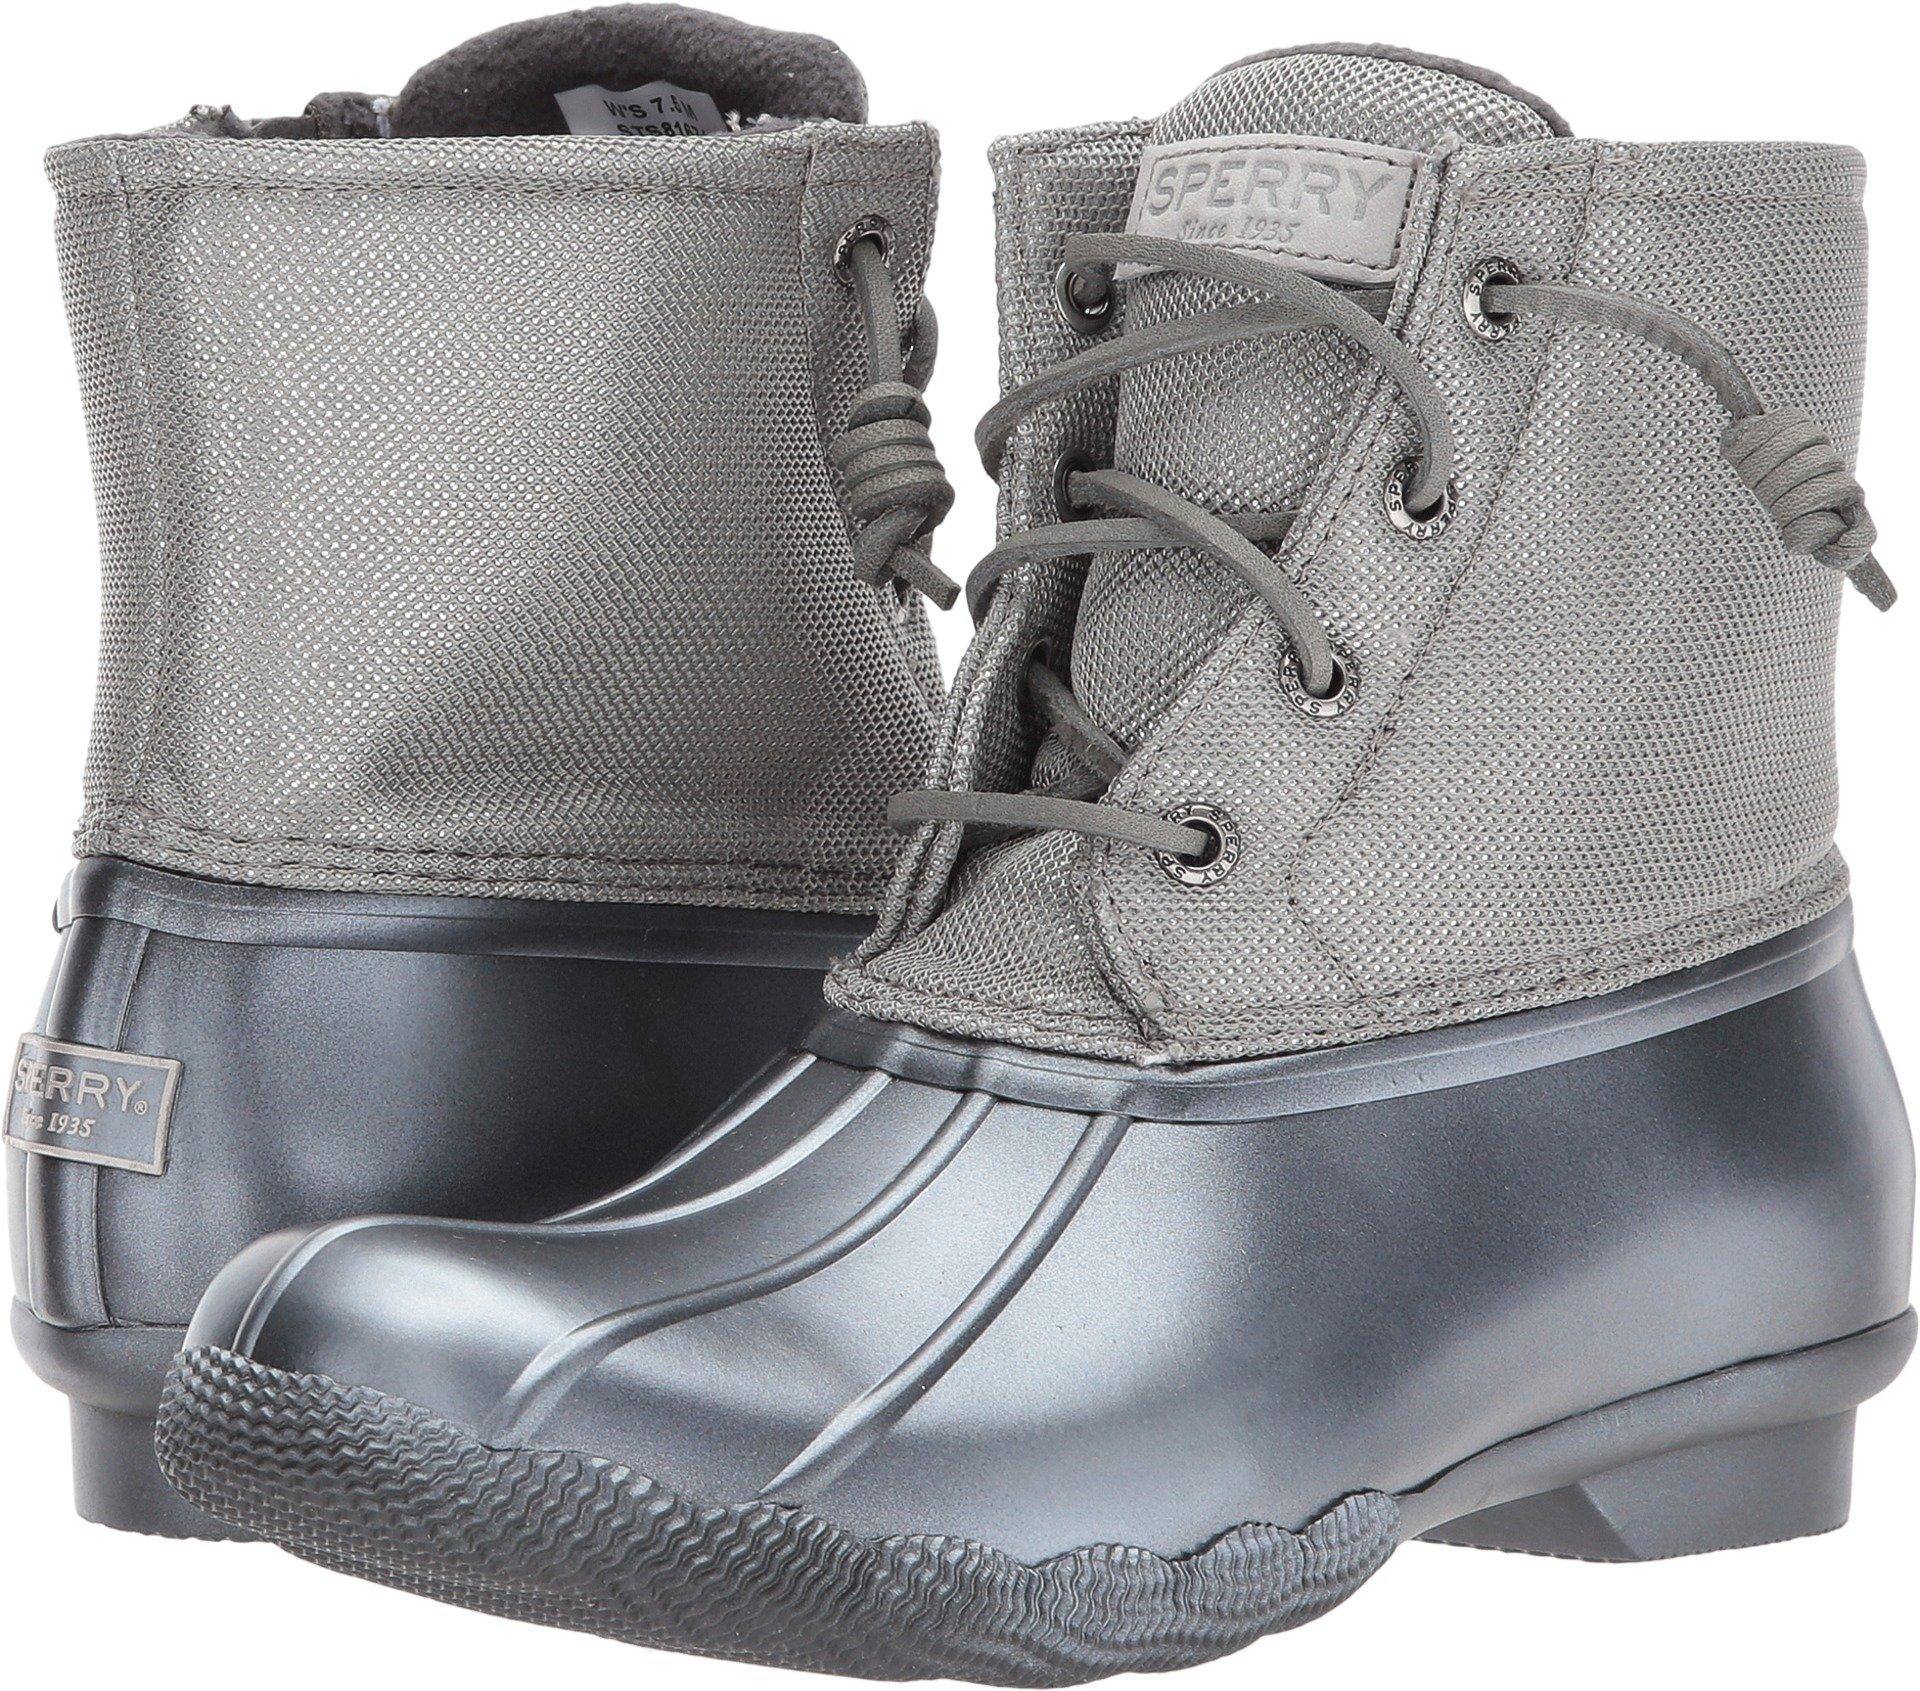 Sperry Top-Sider Women's Saltwater Pearlized Rain Boot, Gunmetal, 6 Medium US